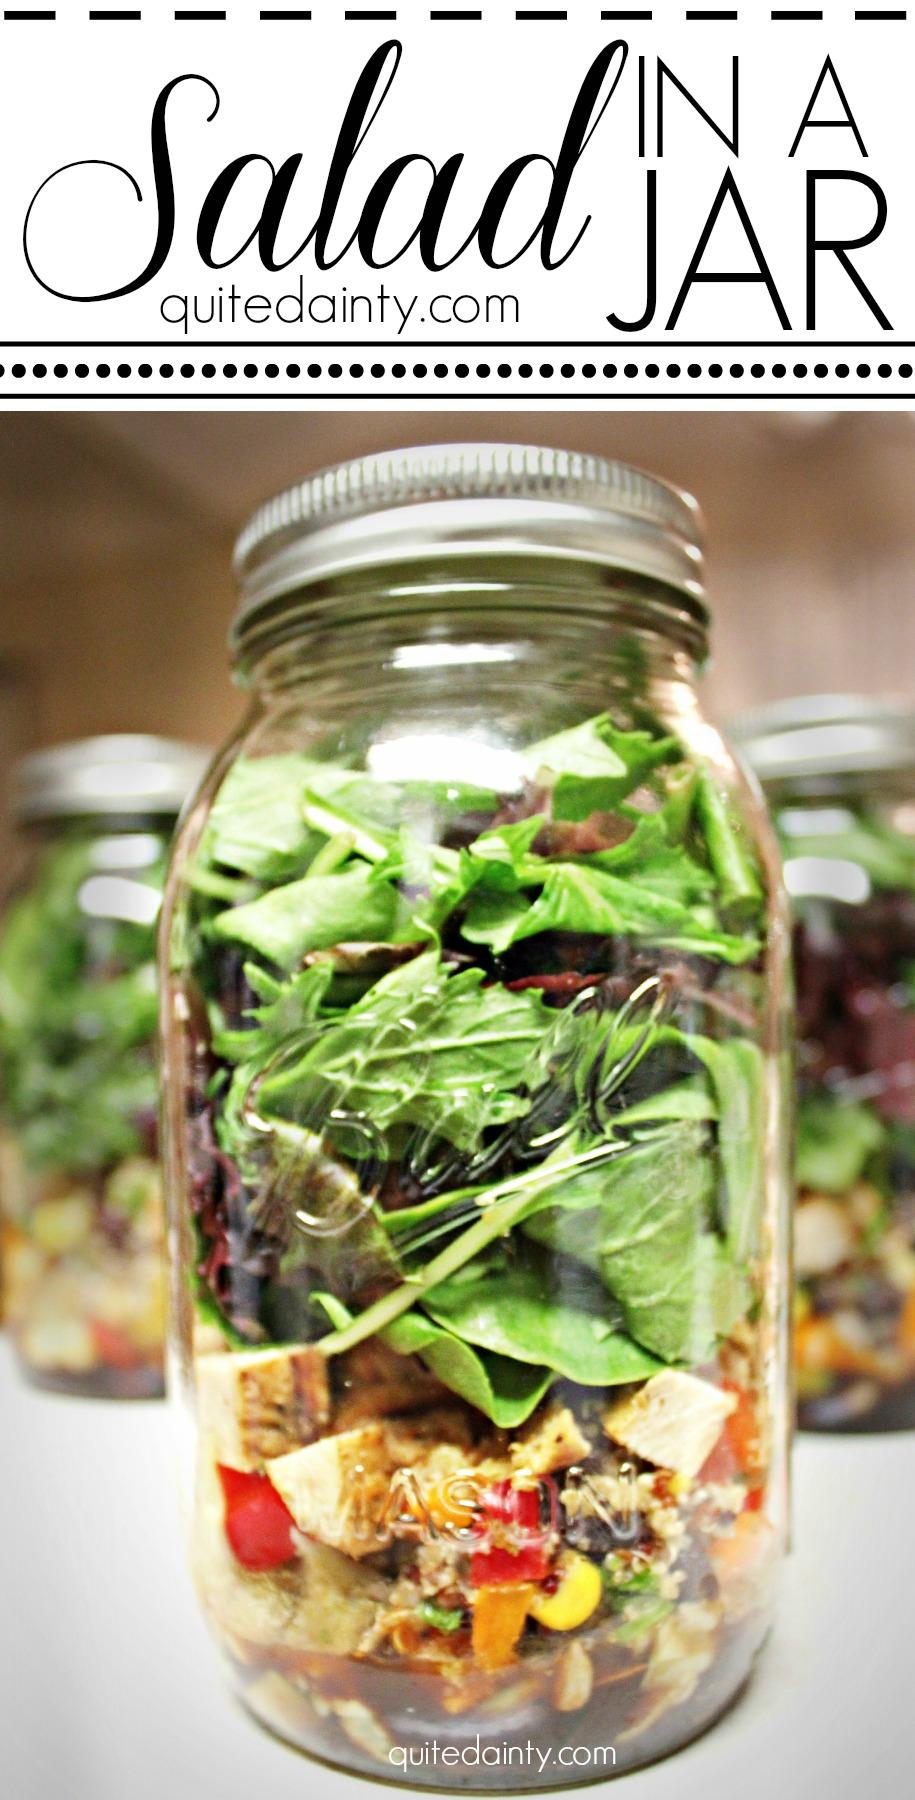 salad-in-a-jar-graphic.jpg